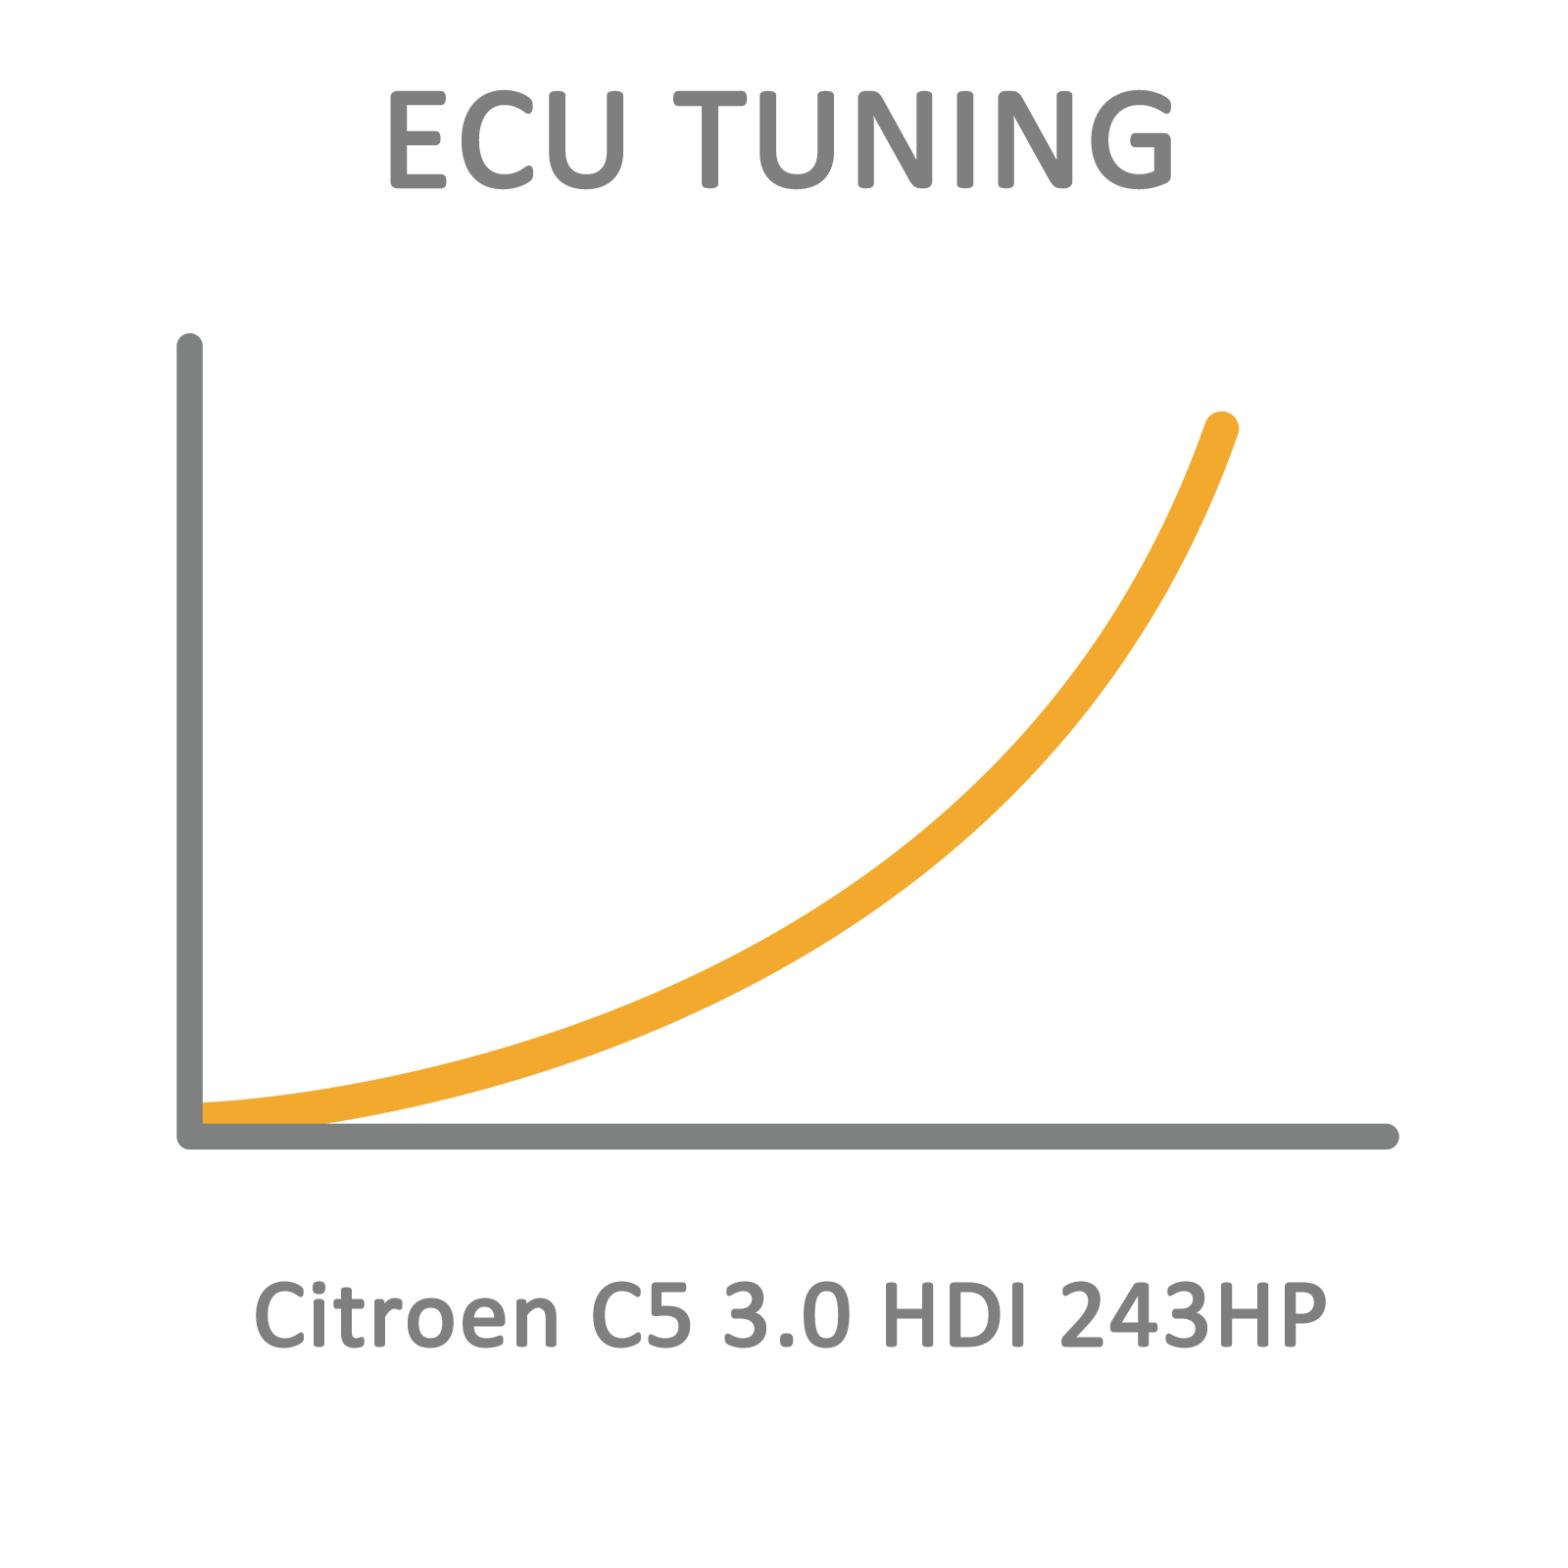 Citroen C5 3.0 HDI 243HP ECU Tuning Remapping Programming